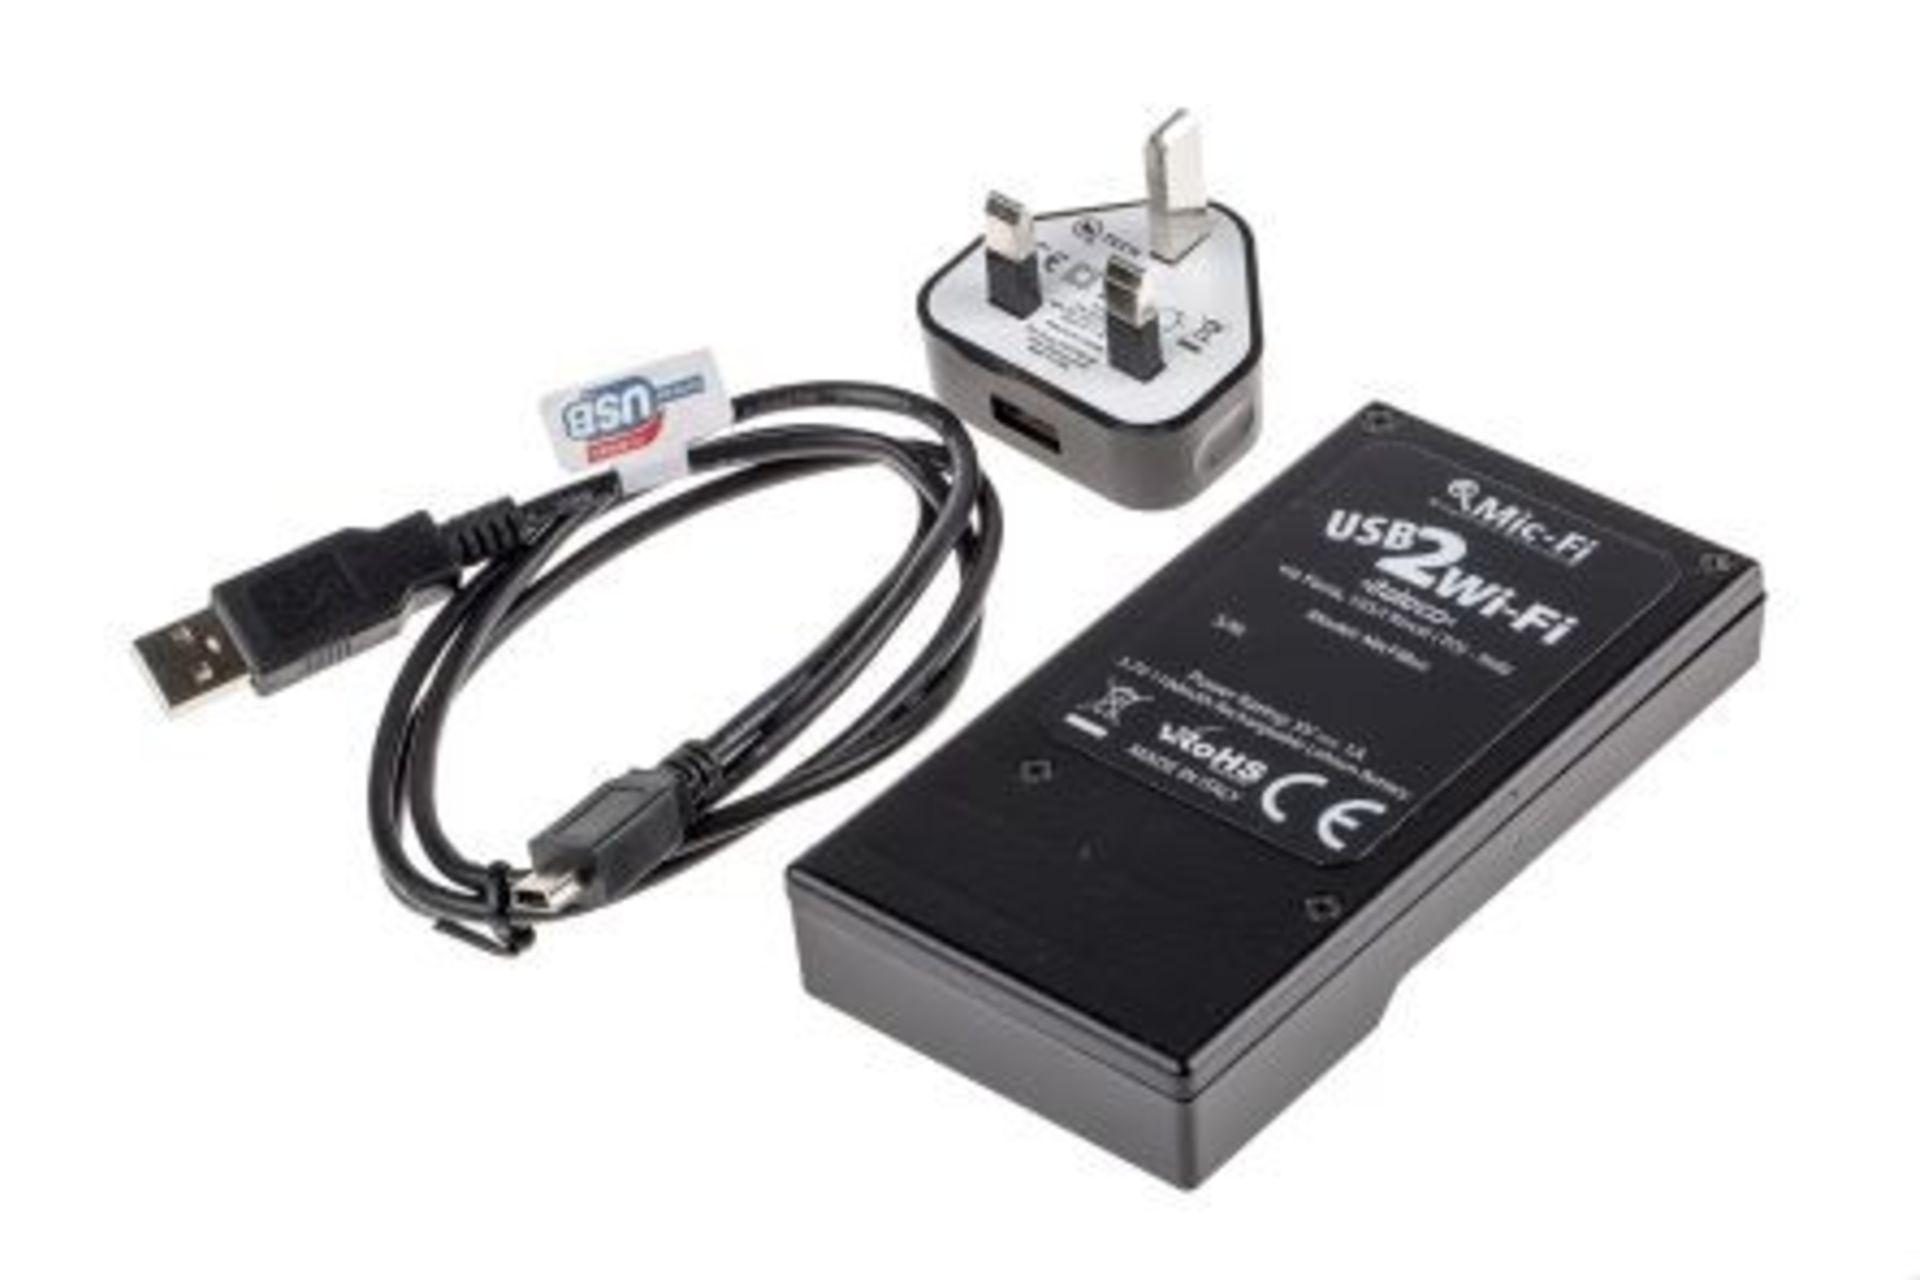 Wi Fi Digi box streamer USB-Wi-Fi - Microscope / Endoscope / Eyepiece Camera - Image 2 of 2